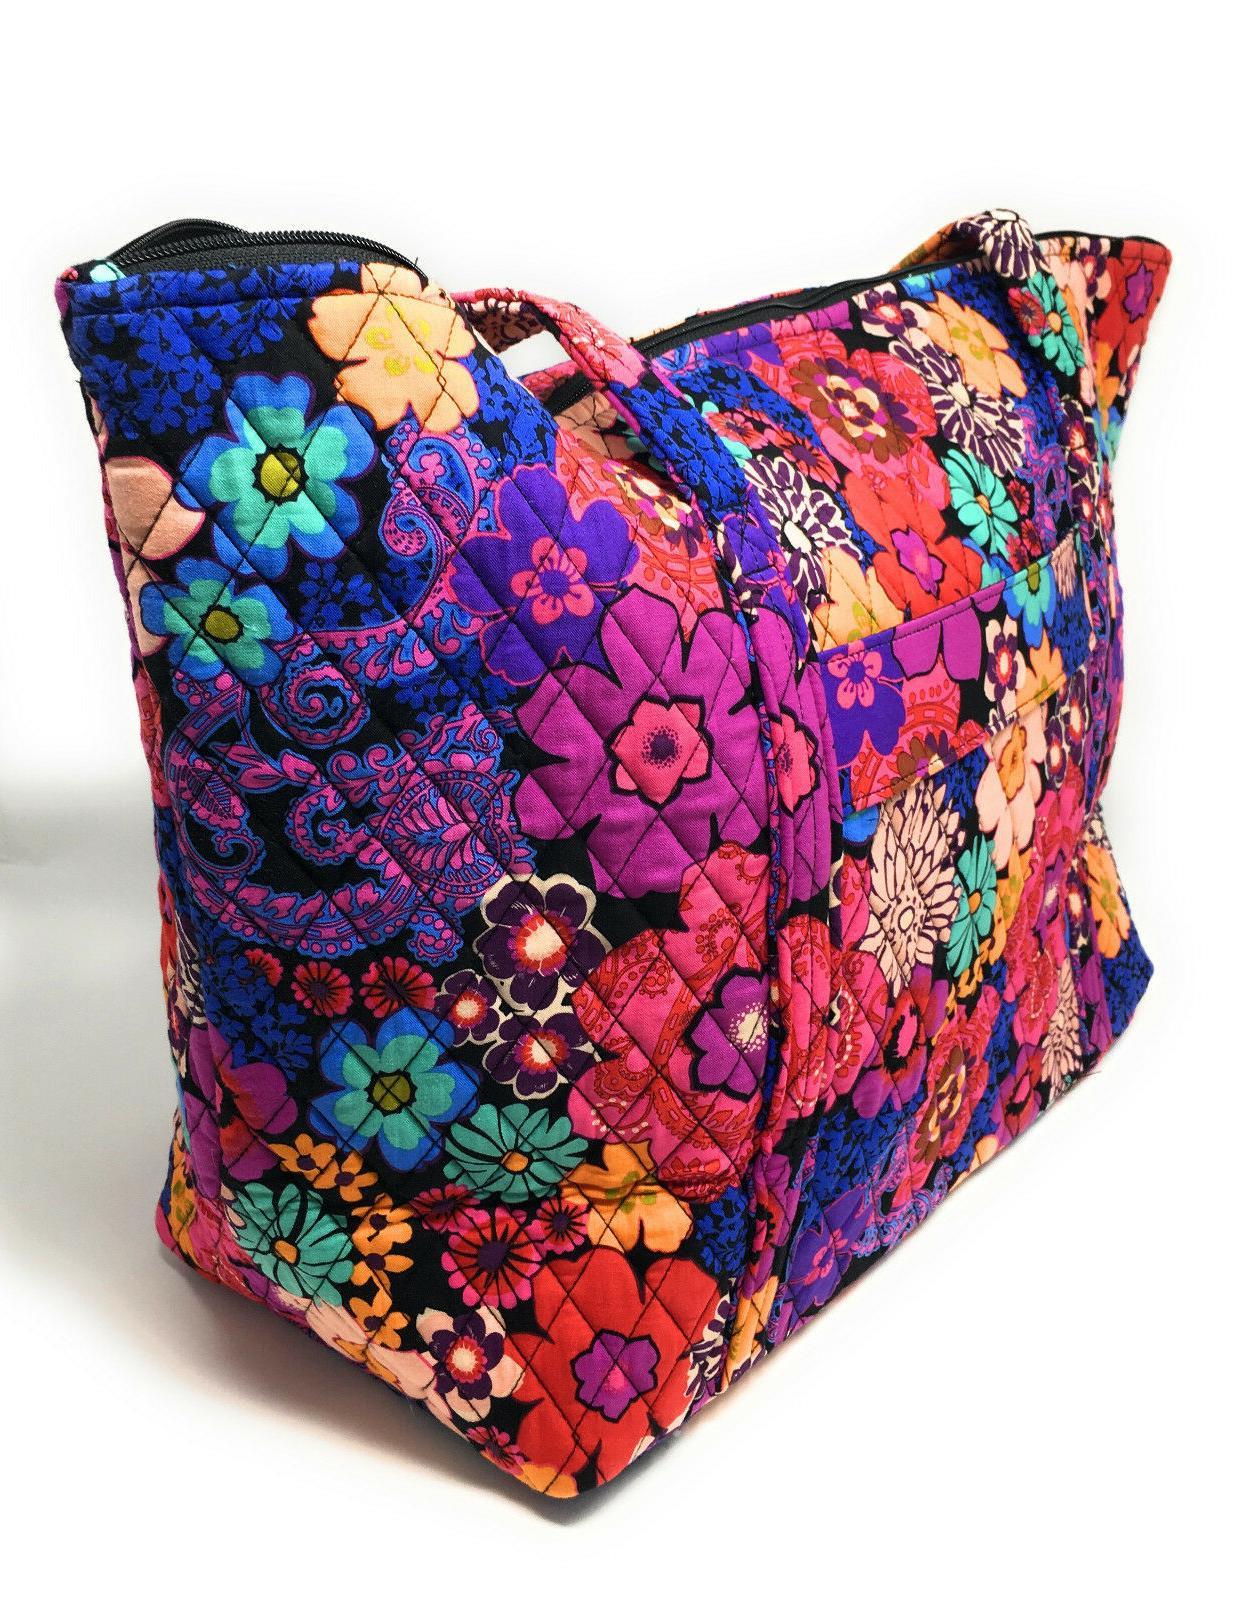 Vera Bradley Bag Carryon Floral $88.00 MSRP!